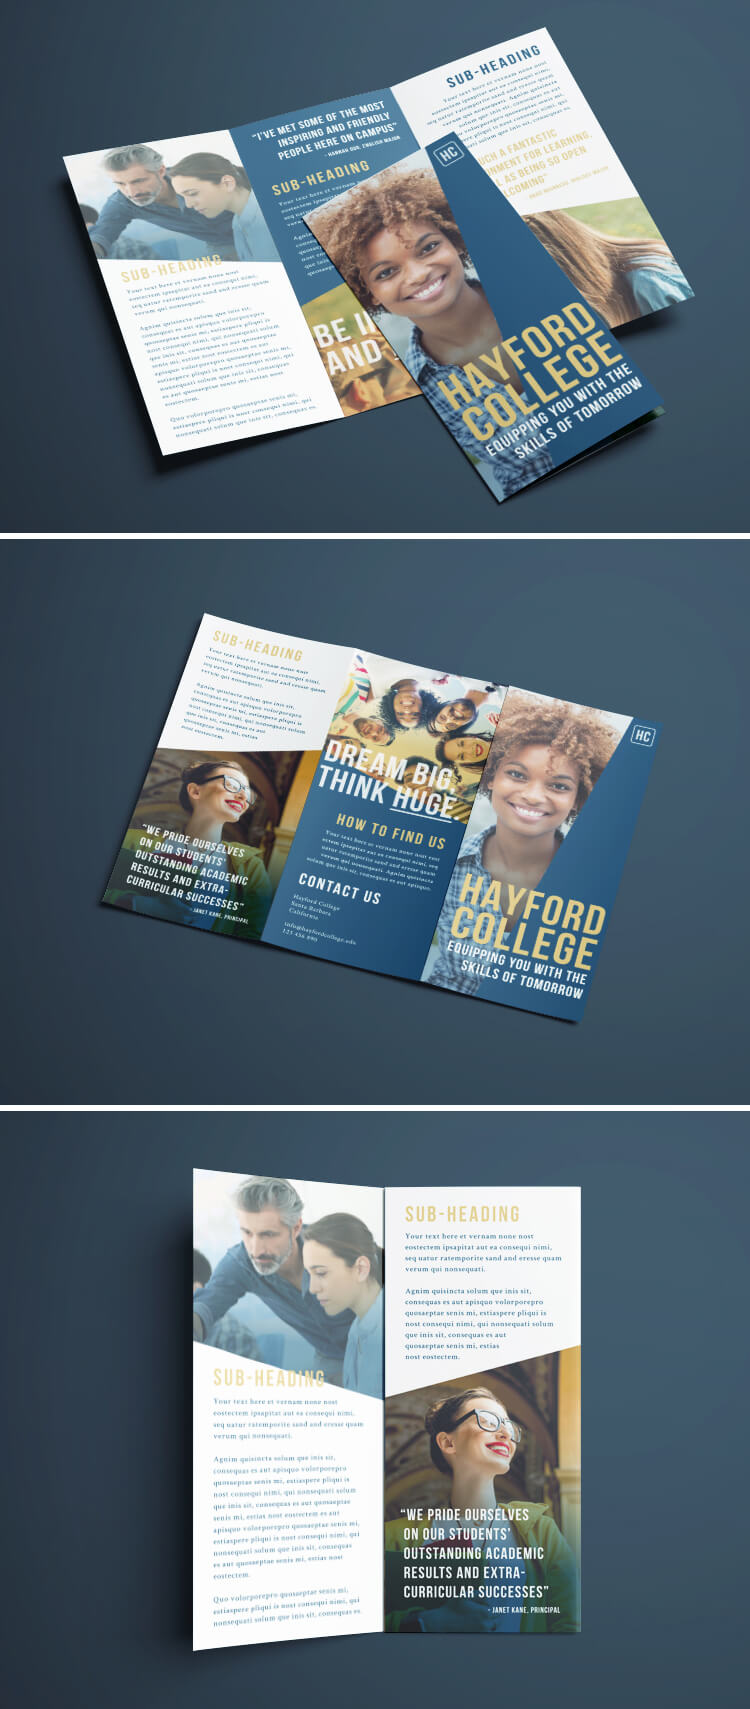 Free Tri-Fold Brochure Layout Download - Smart Blue. Gold & White College Design